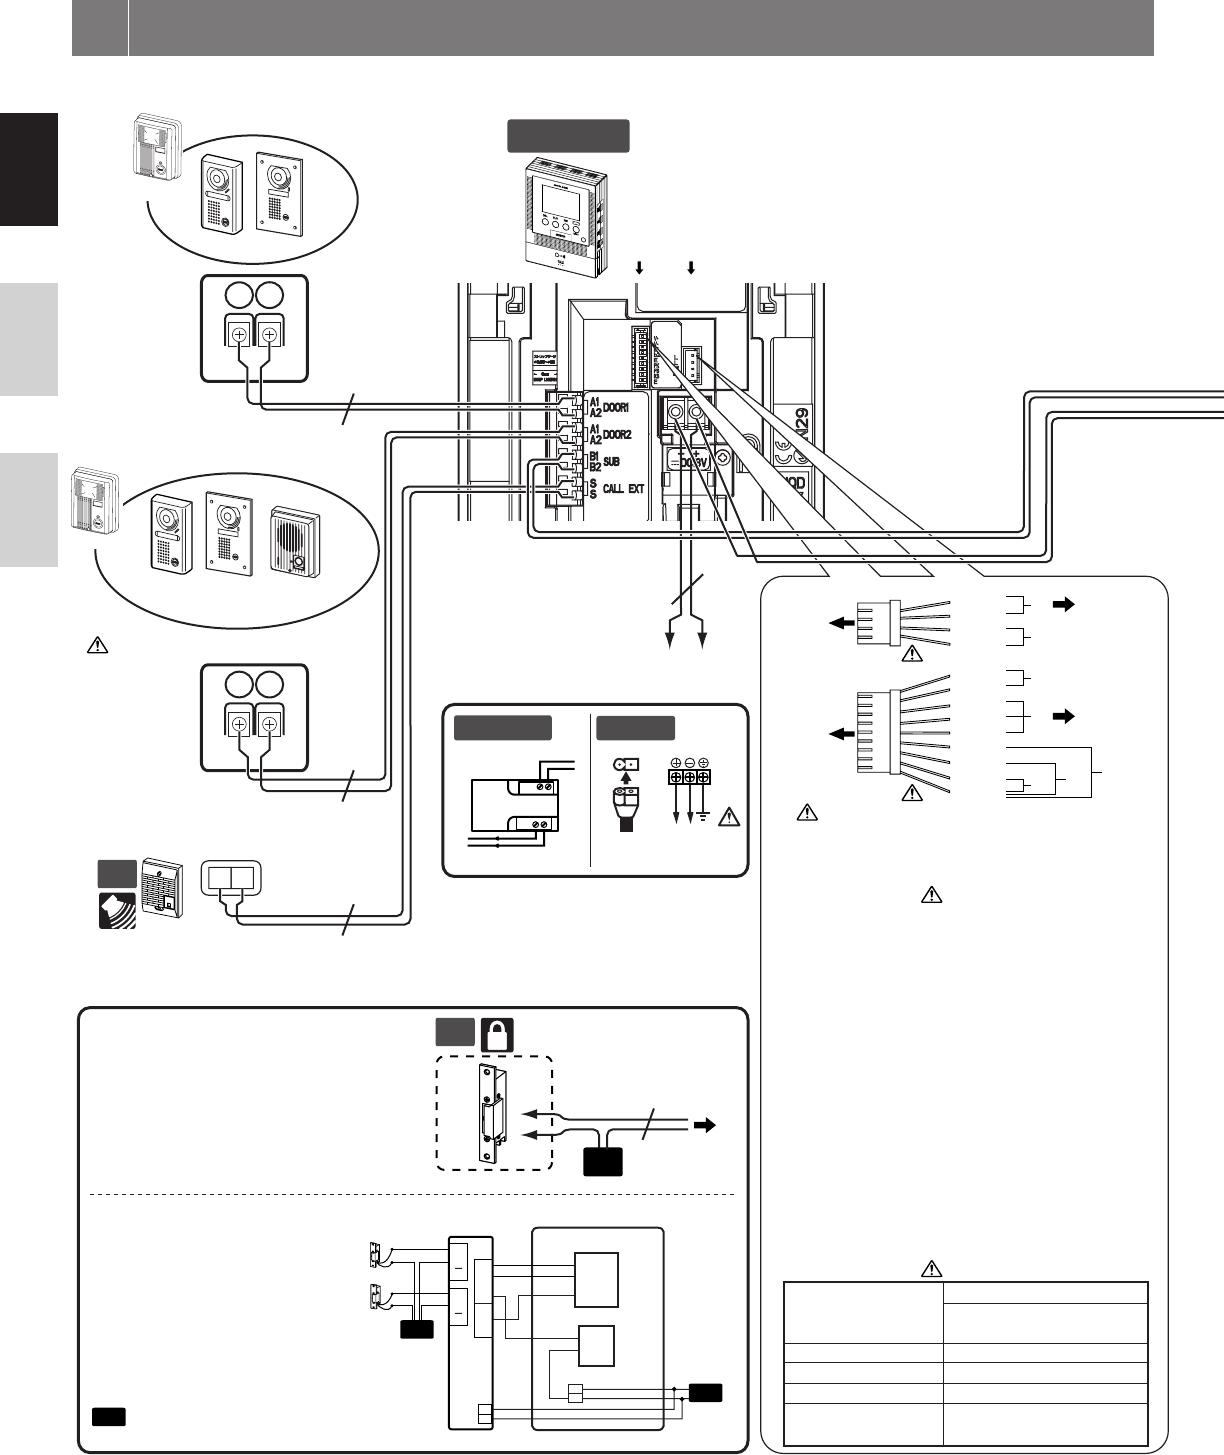 Aiphone Lef 3l Wiring Diagram